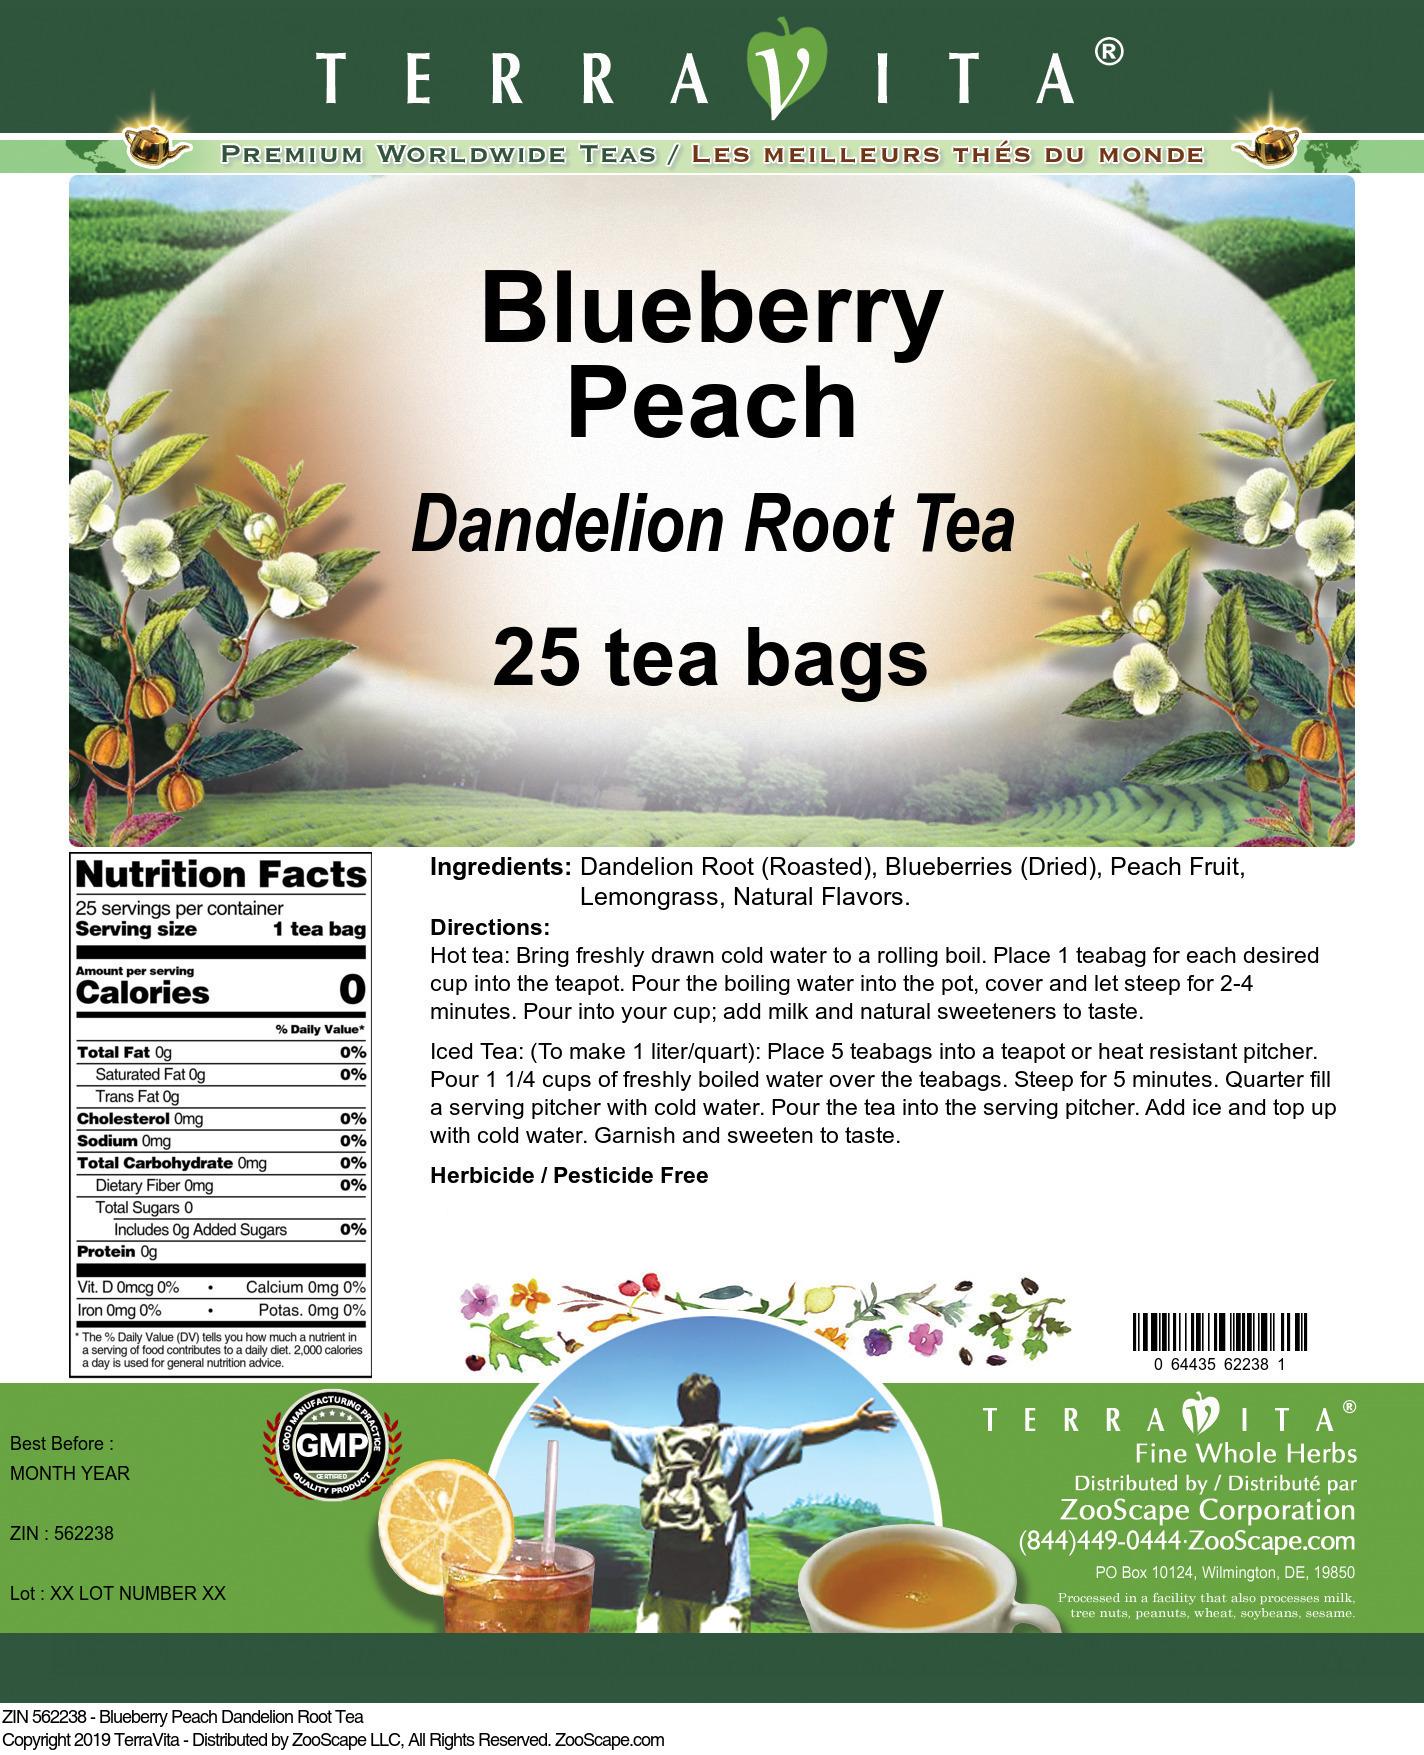 Blueberry Peach Dandelion Root